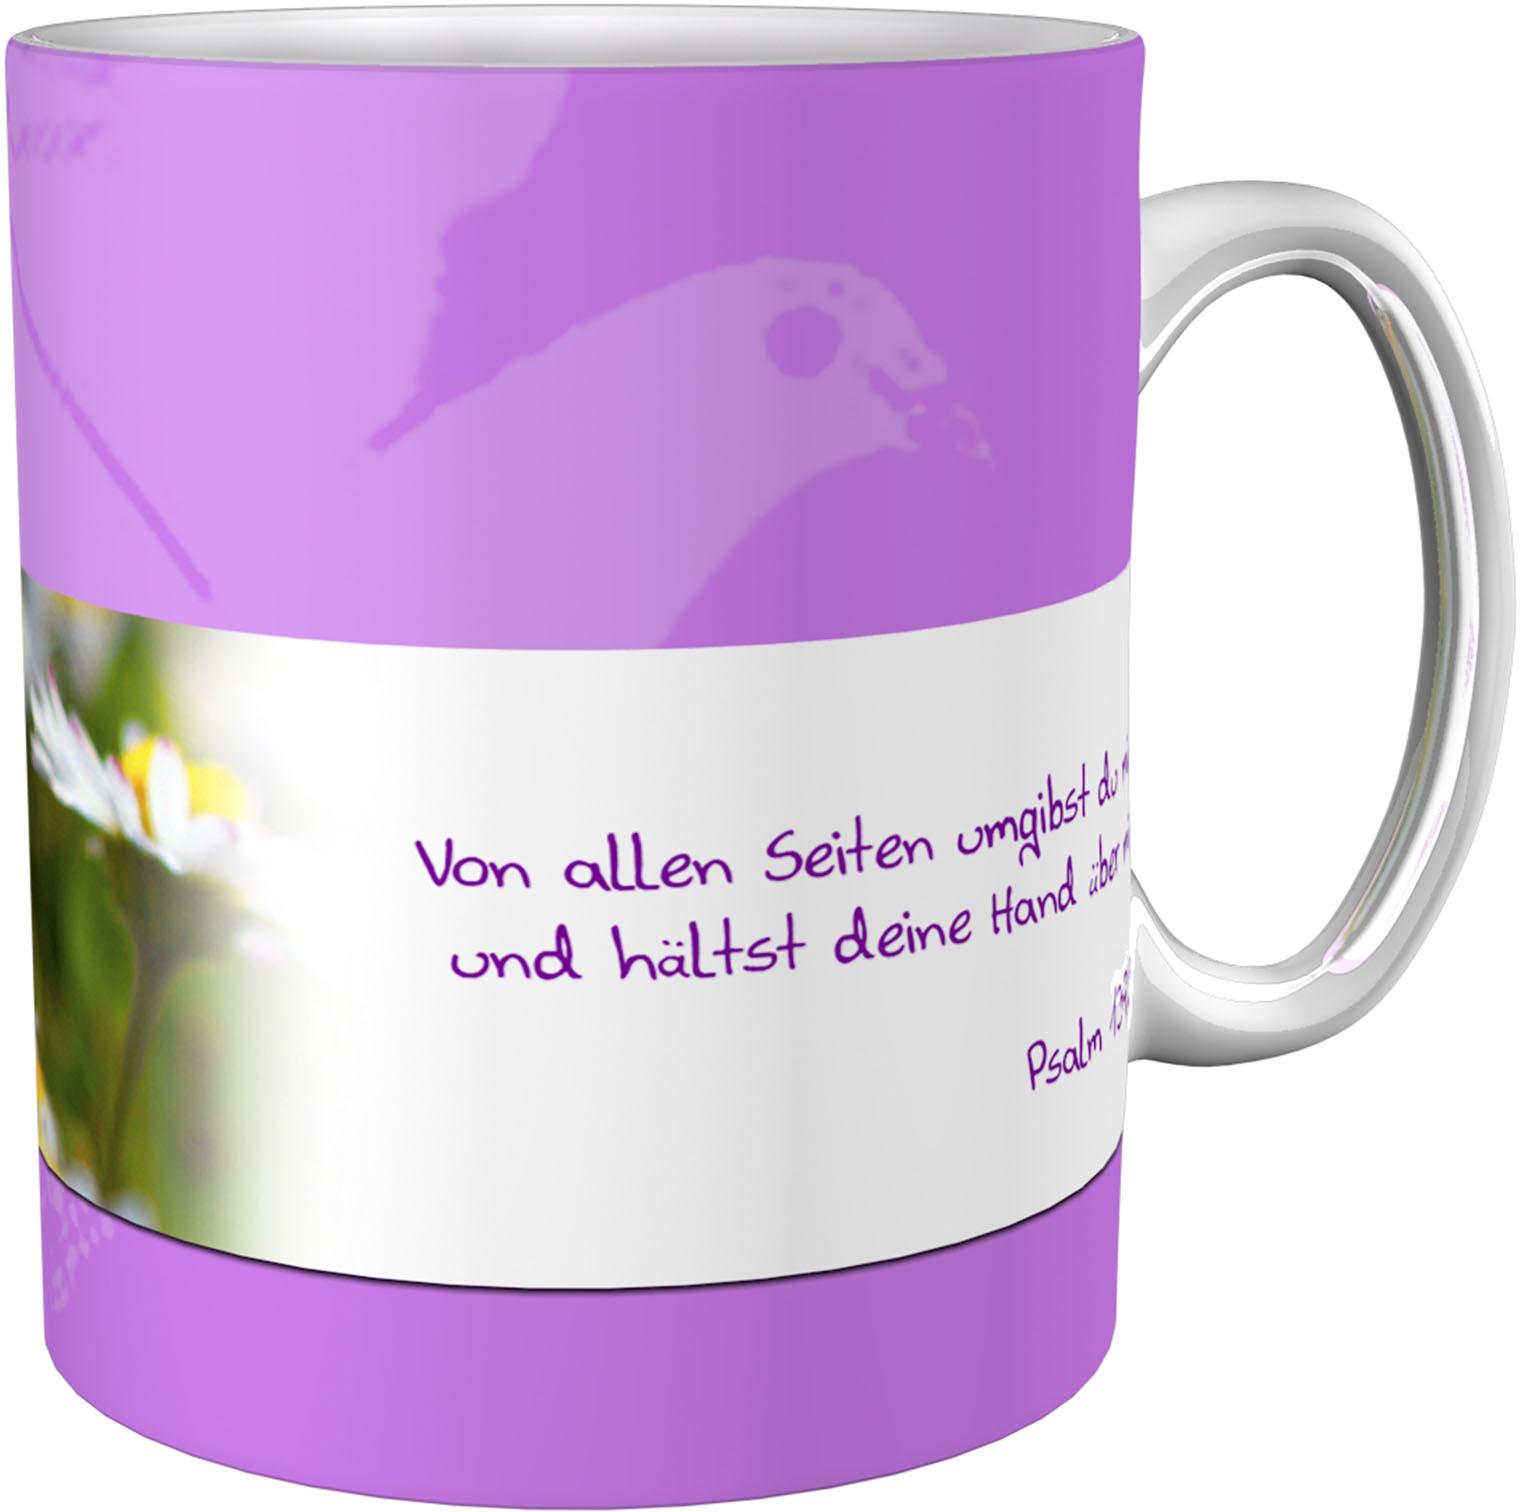 Kaffeetasse / Kaffeebecher / Margeriten / Christlich